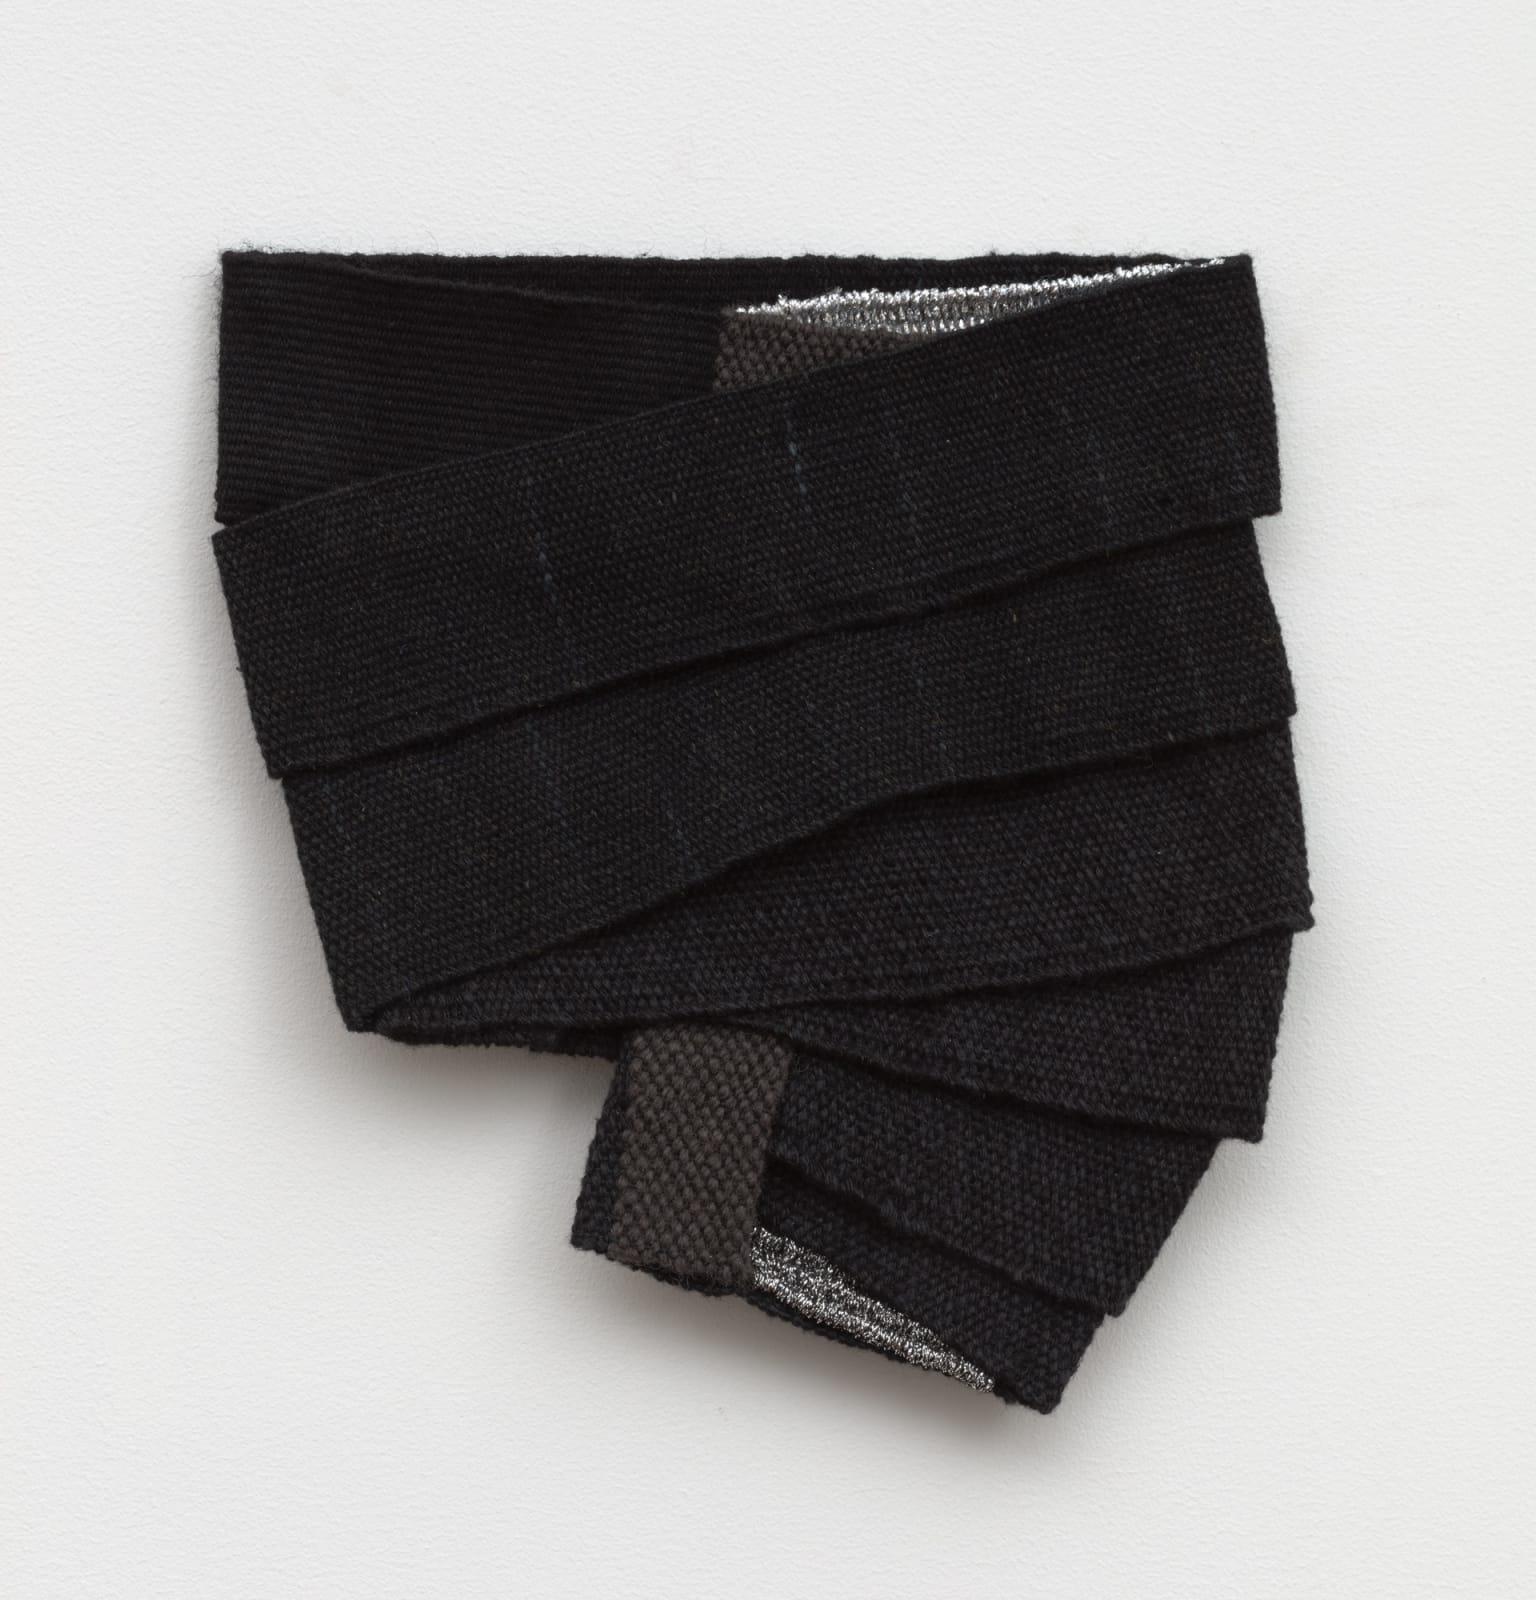 Hana Miletić (b. 1982) Materials, 2019 hand-woven textile 9 3/8 x 8 3/8 x 3/4 in (23.8 x 21.3 x 1.9 cm) (MIL7816)